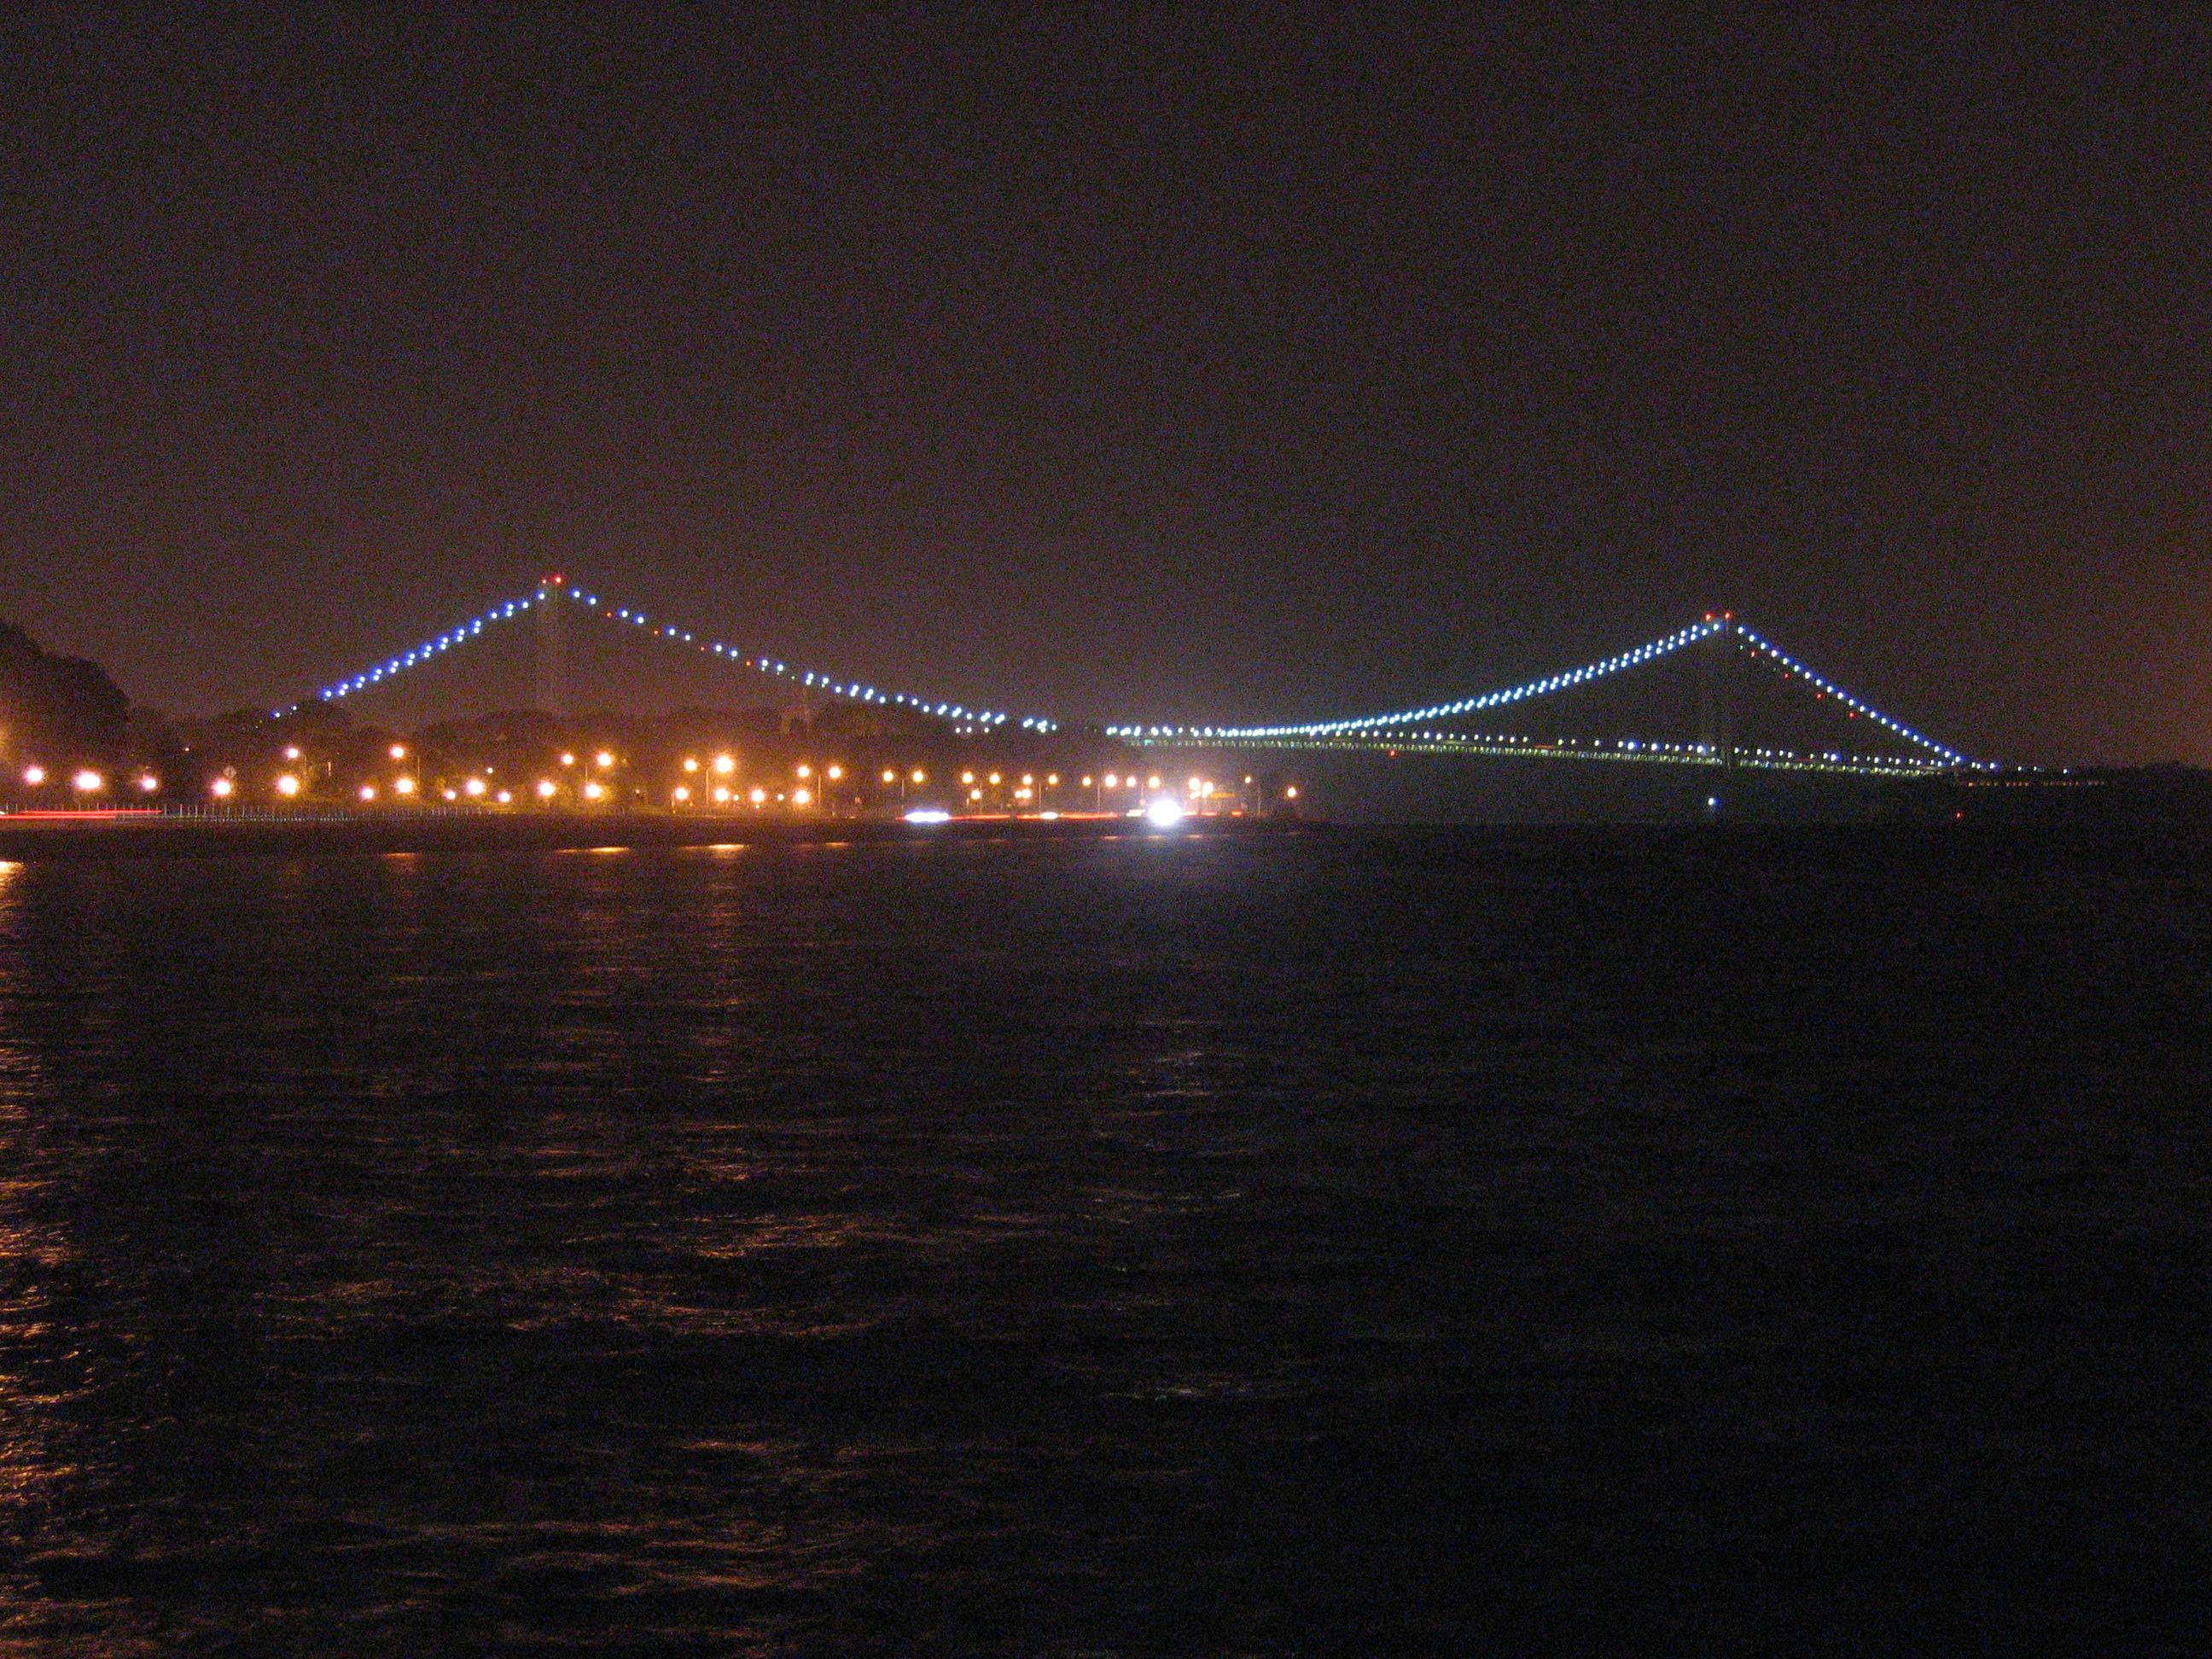 File:800px-Verrazano-Narrows Bridge at night.JPG ...